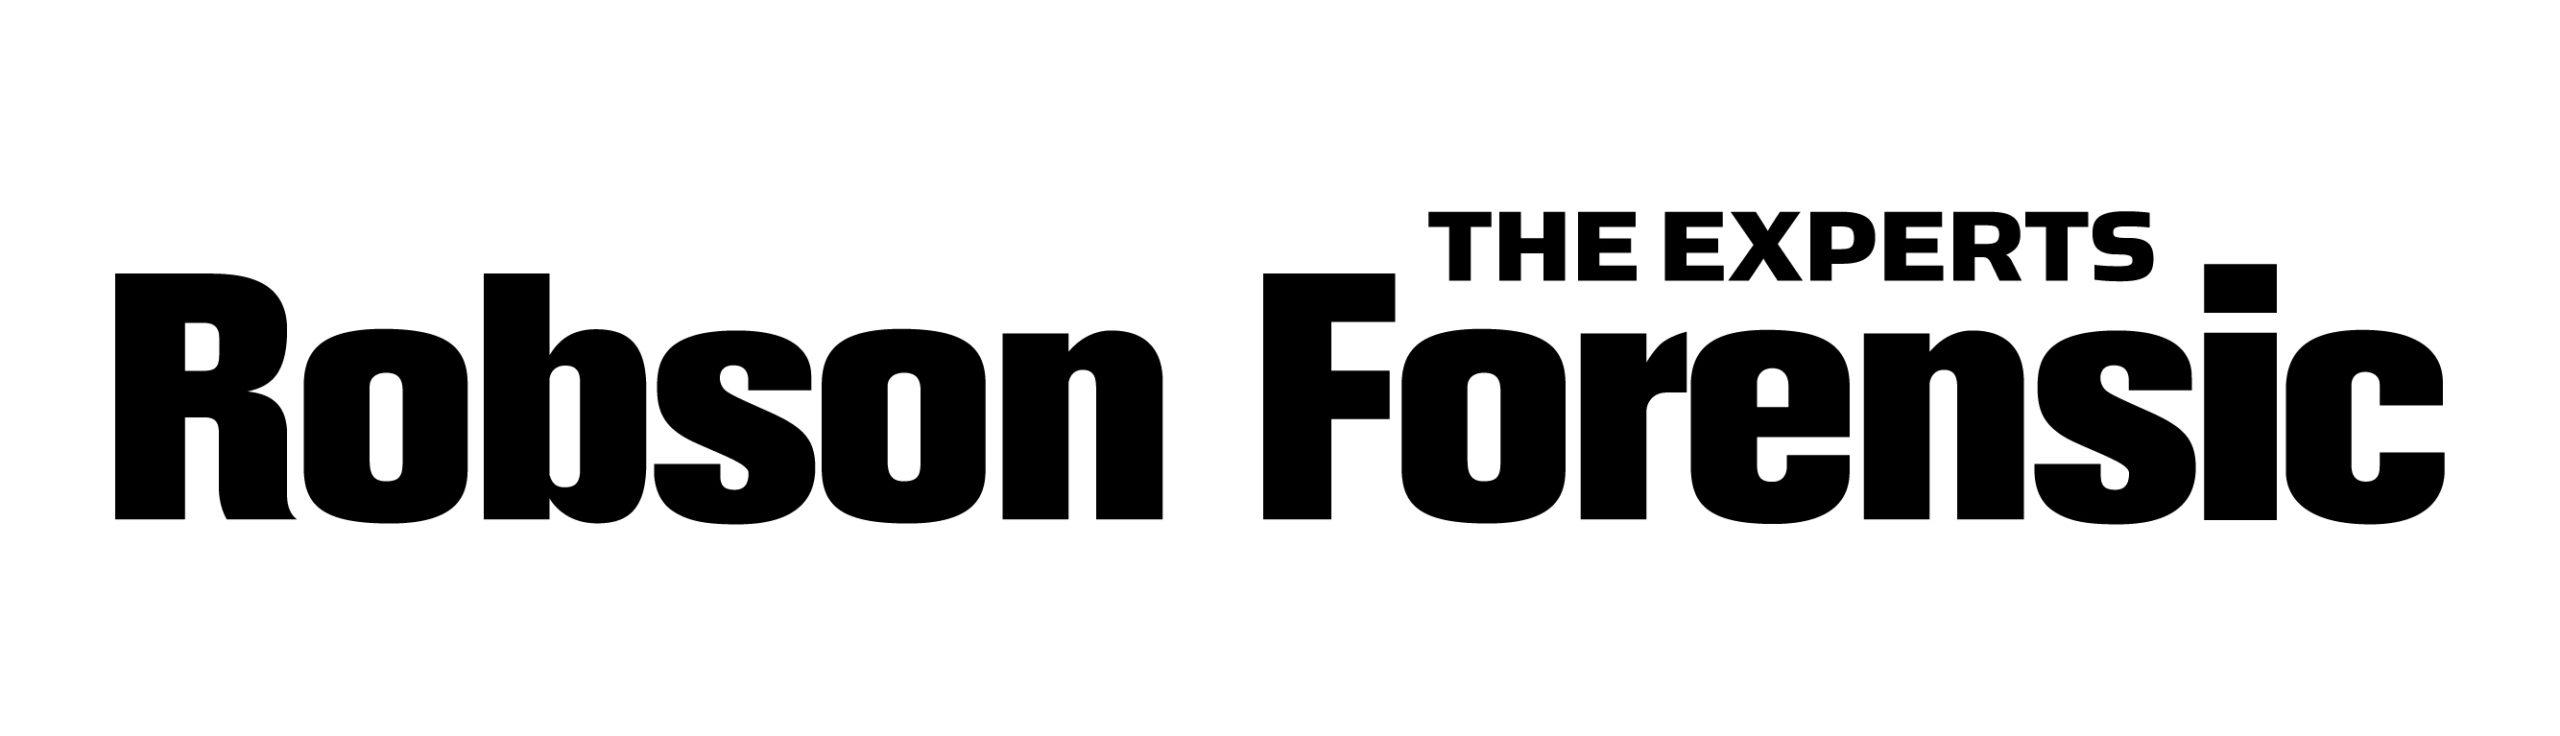 RobsonForensic NEW logo black